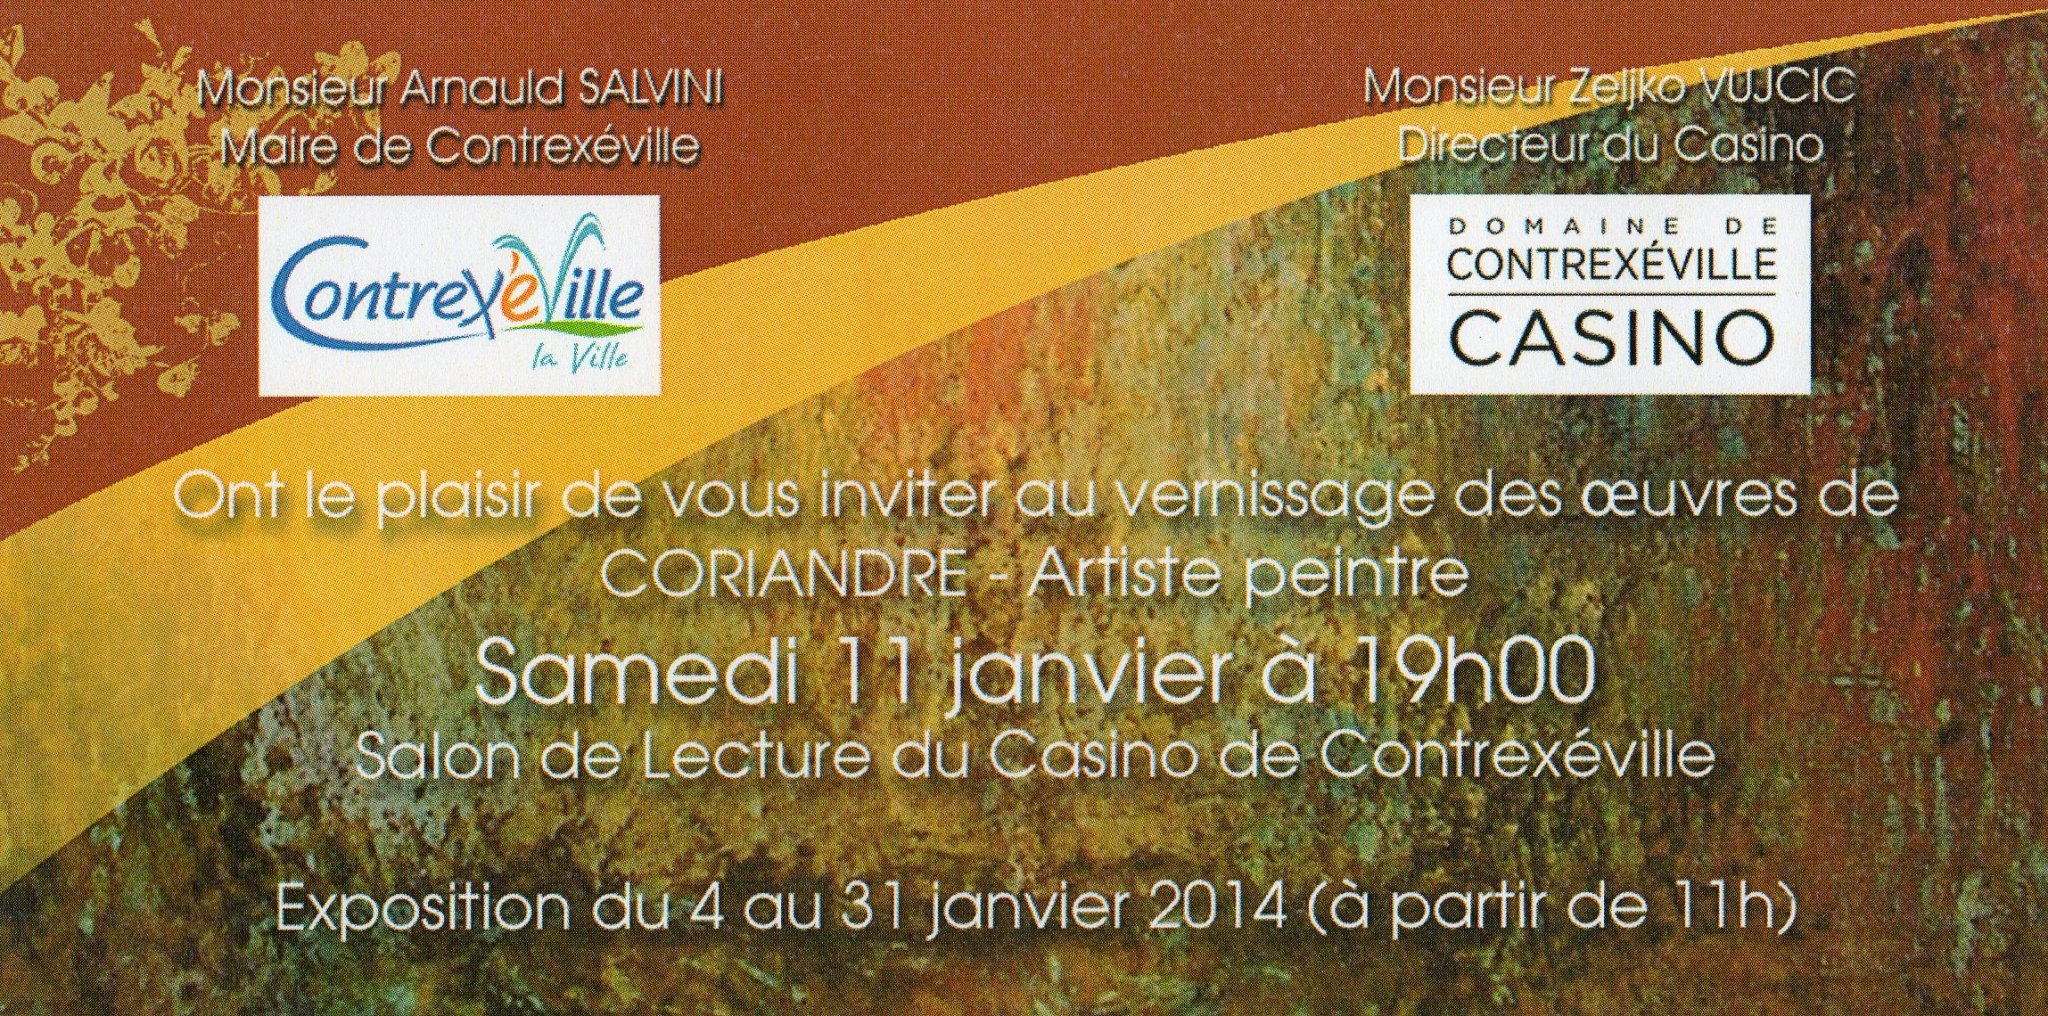 Exposition au Casino de Contrexéville